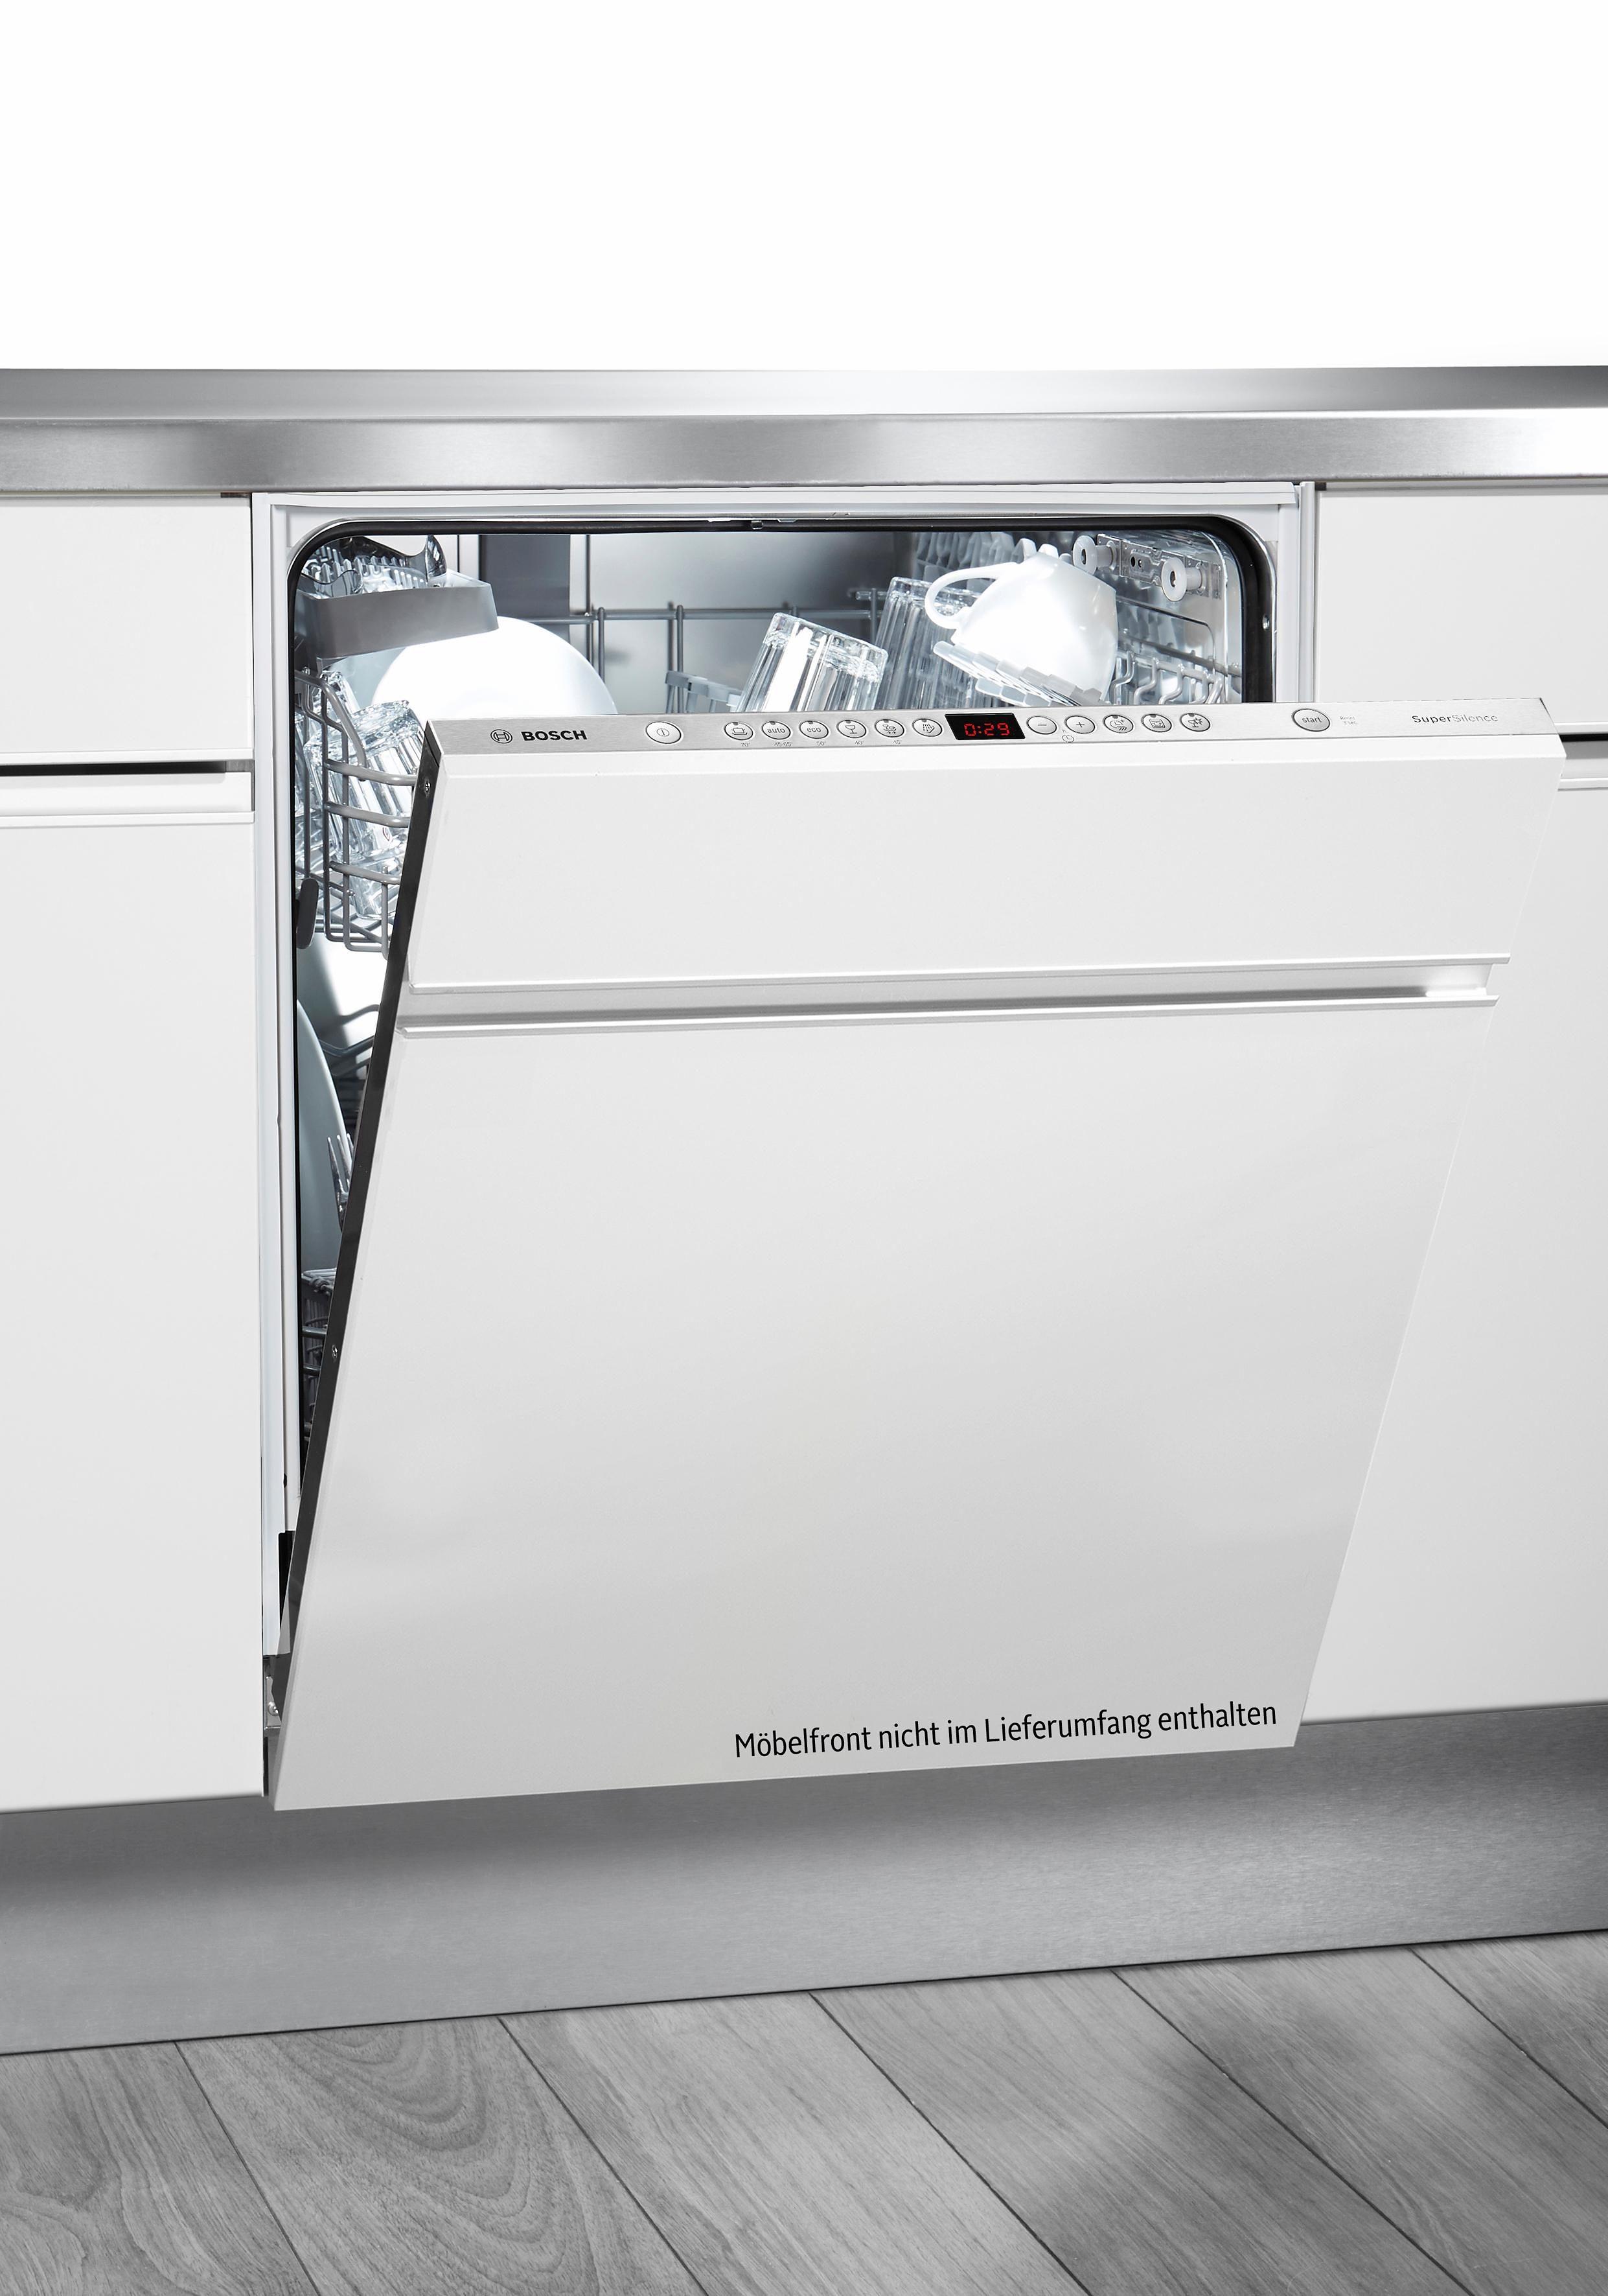 Bosch vollintegrierbarer Einbaugeschirrspüler SBV63N60EU, Energieklasse: A+++, 9,5 l, 13 Gedecke